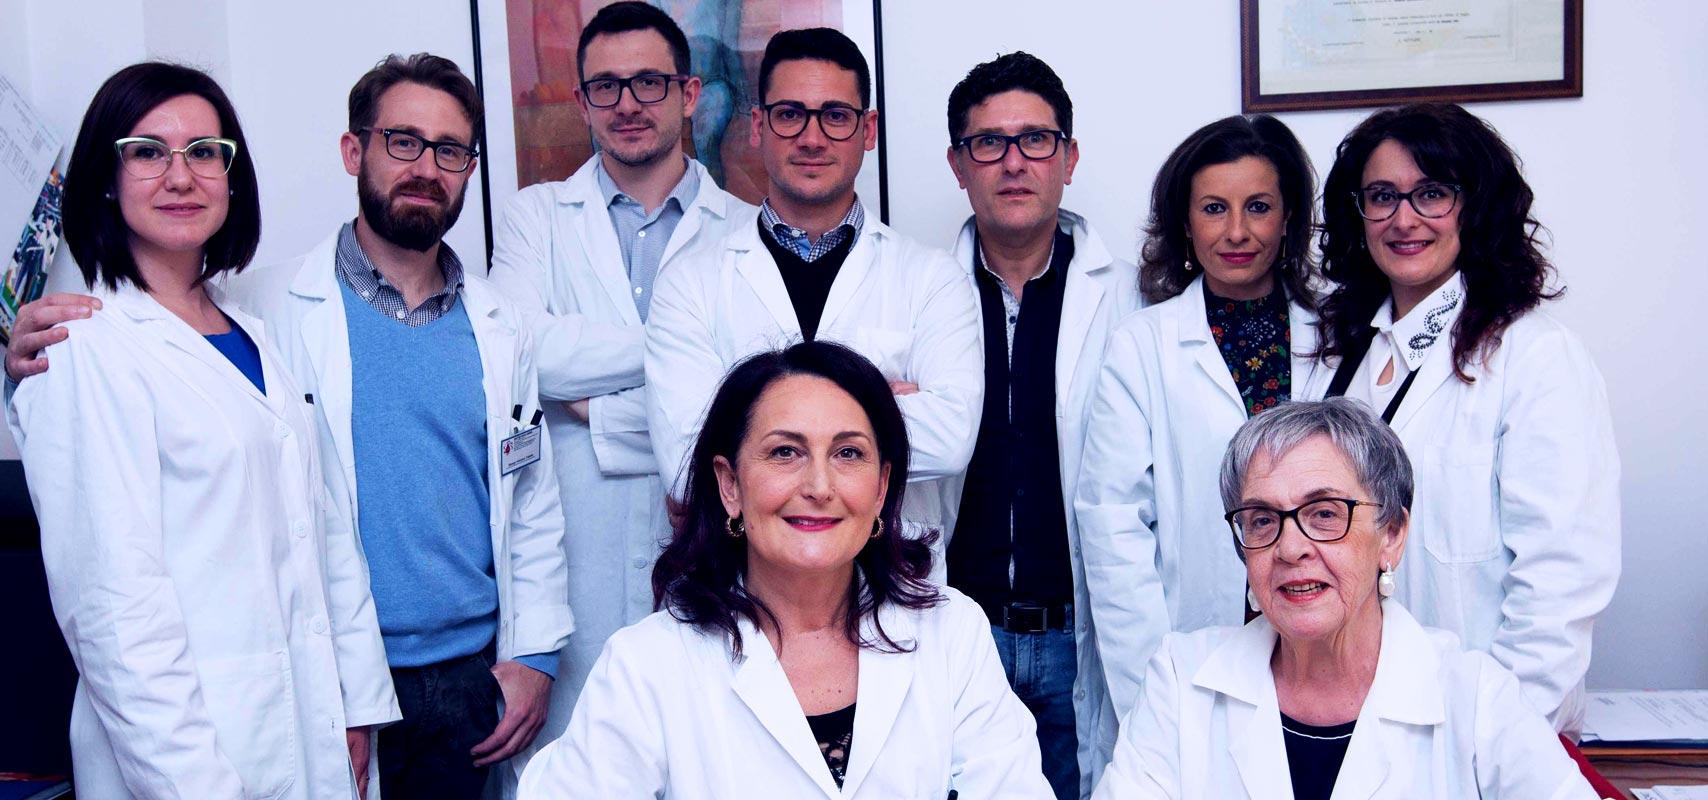 analisi-mediche-laboratorio-biotechnologies-agrigento-caltanissetta-esami-sangue-emocromo-urine-chi-siamo